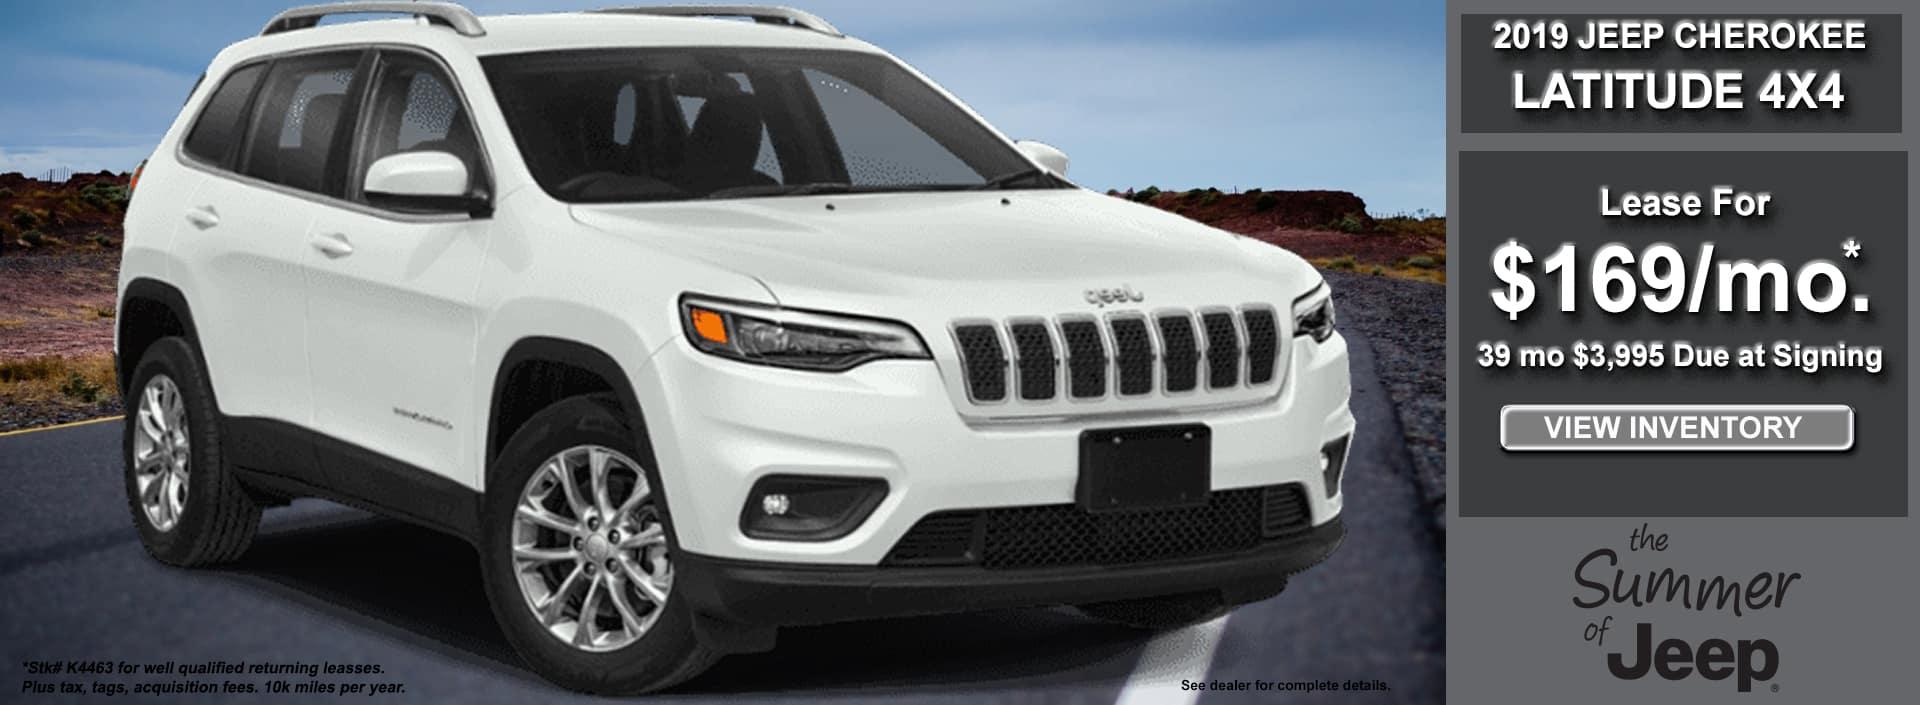 Cherokee Latitude Lease June 2019